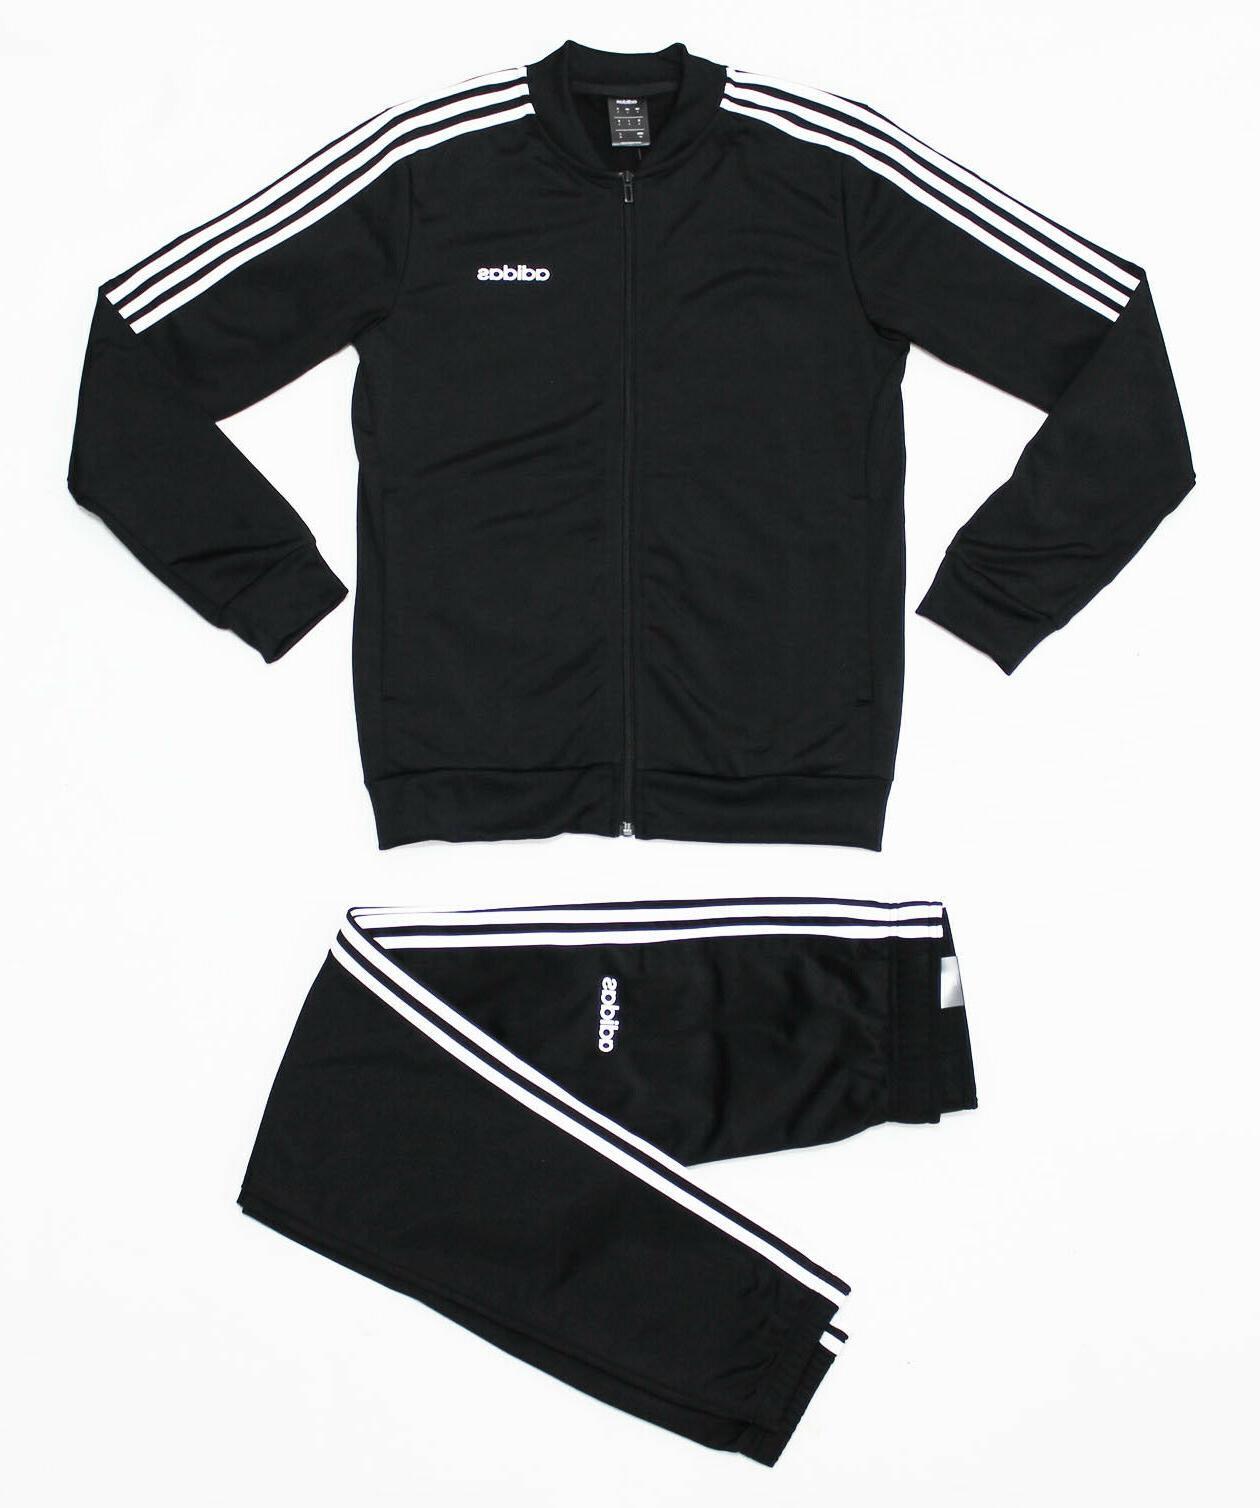 nwt men s black white warm up